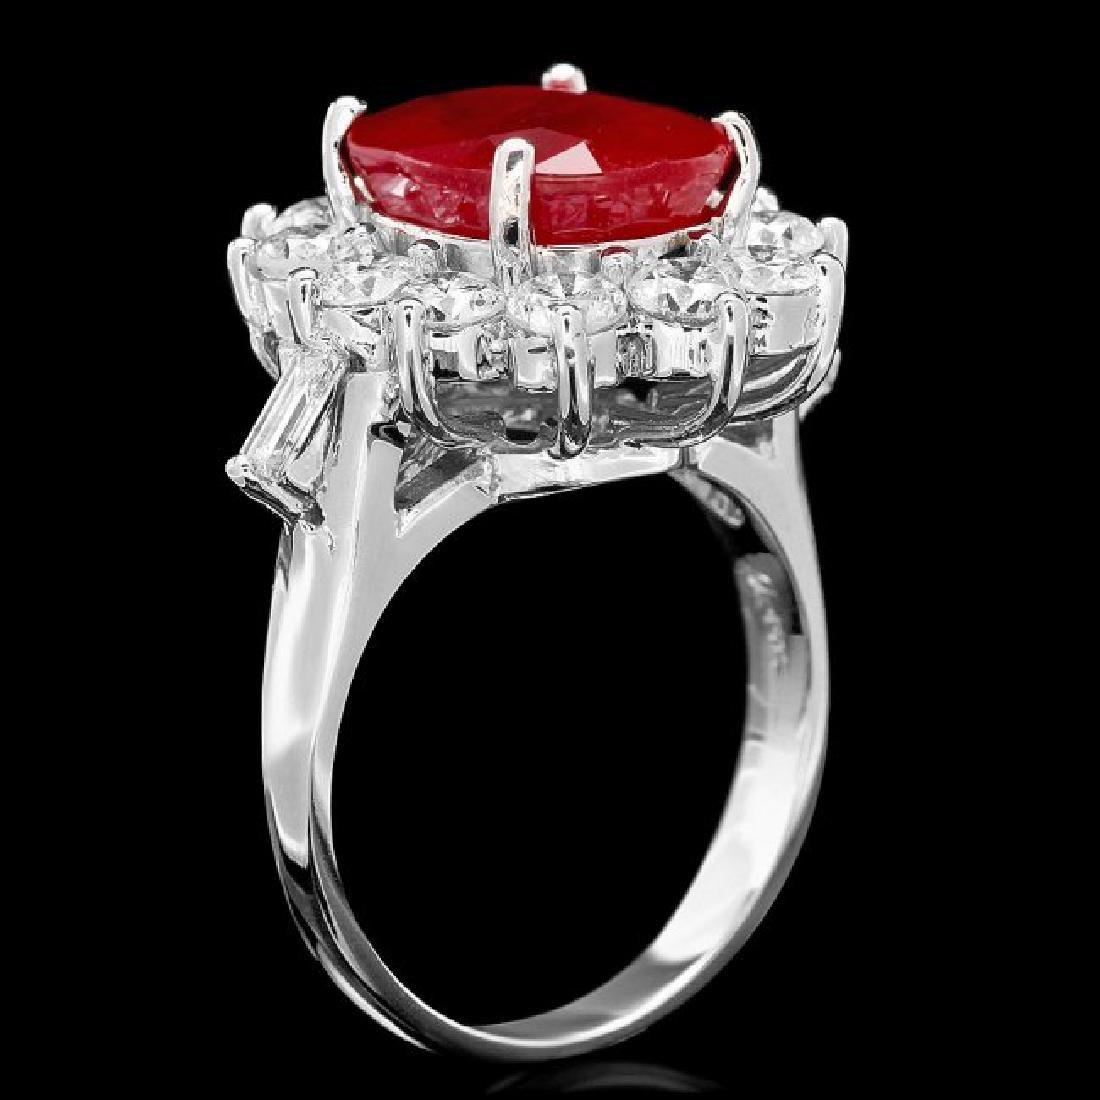 14k White Gold 7.00ct Ruby 2.3ct Diamond Ring - 3